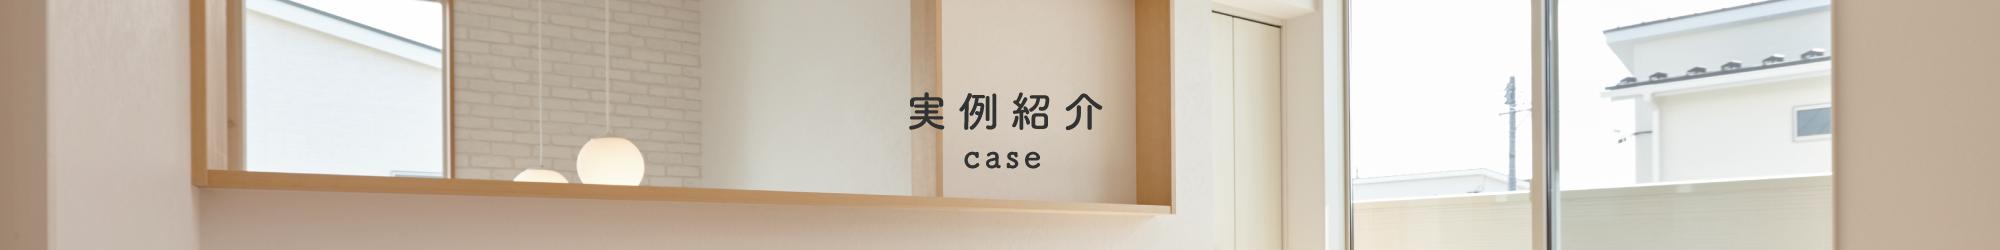 obi_case_2020